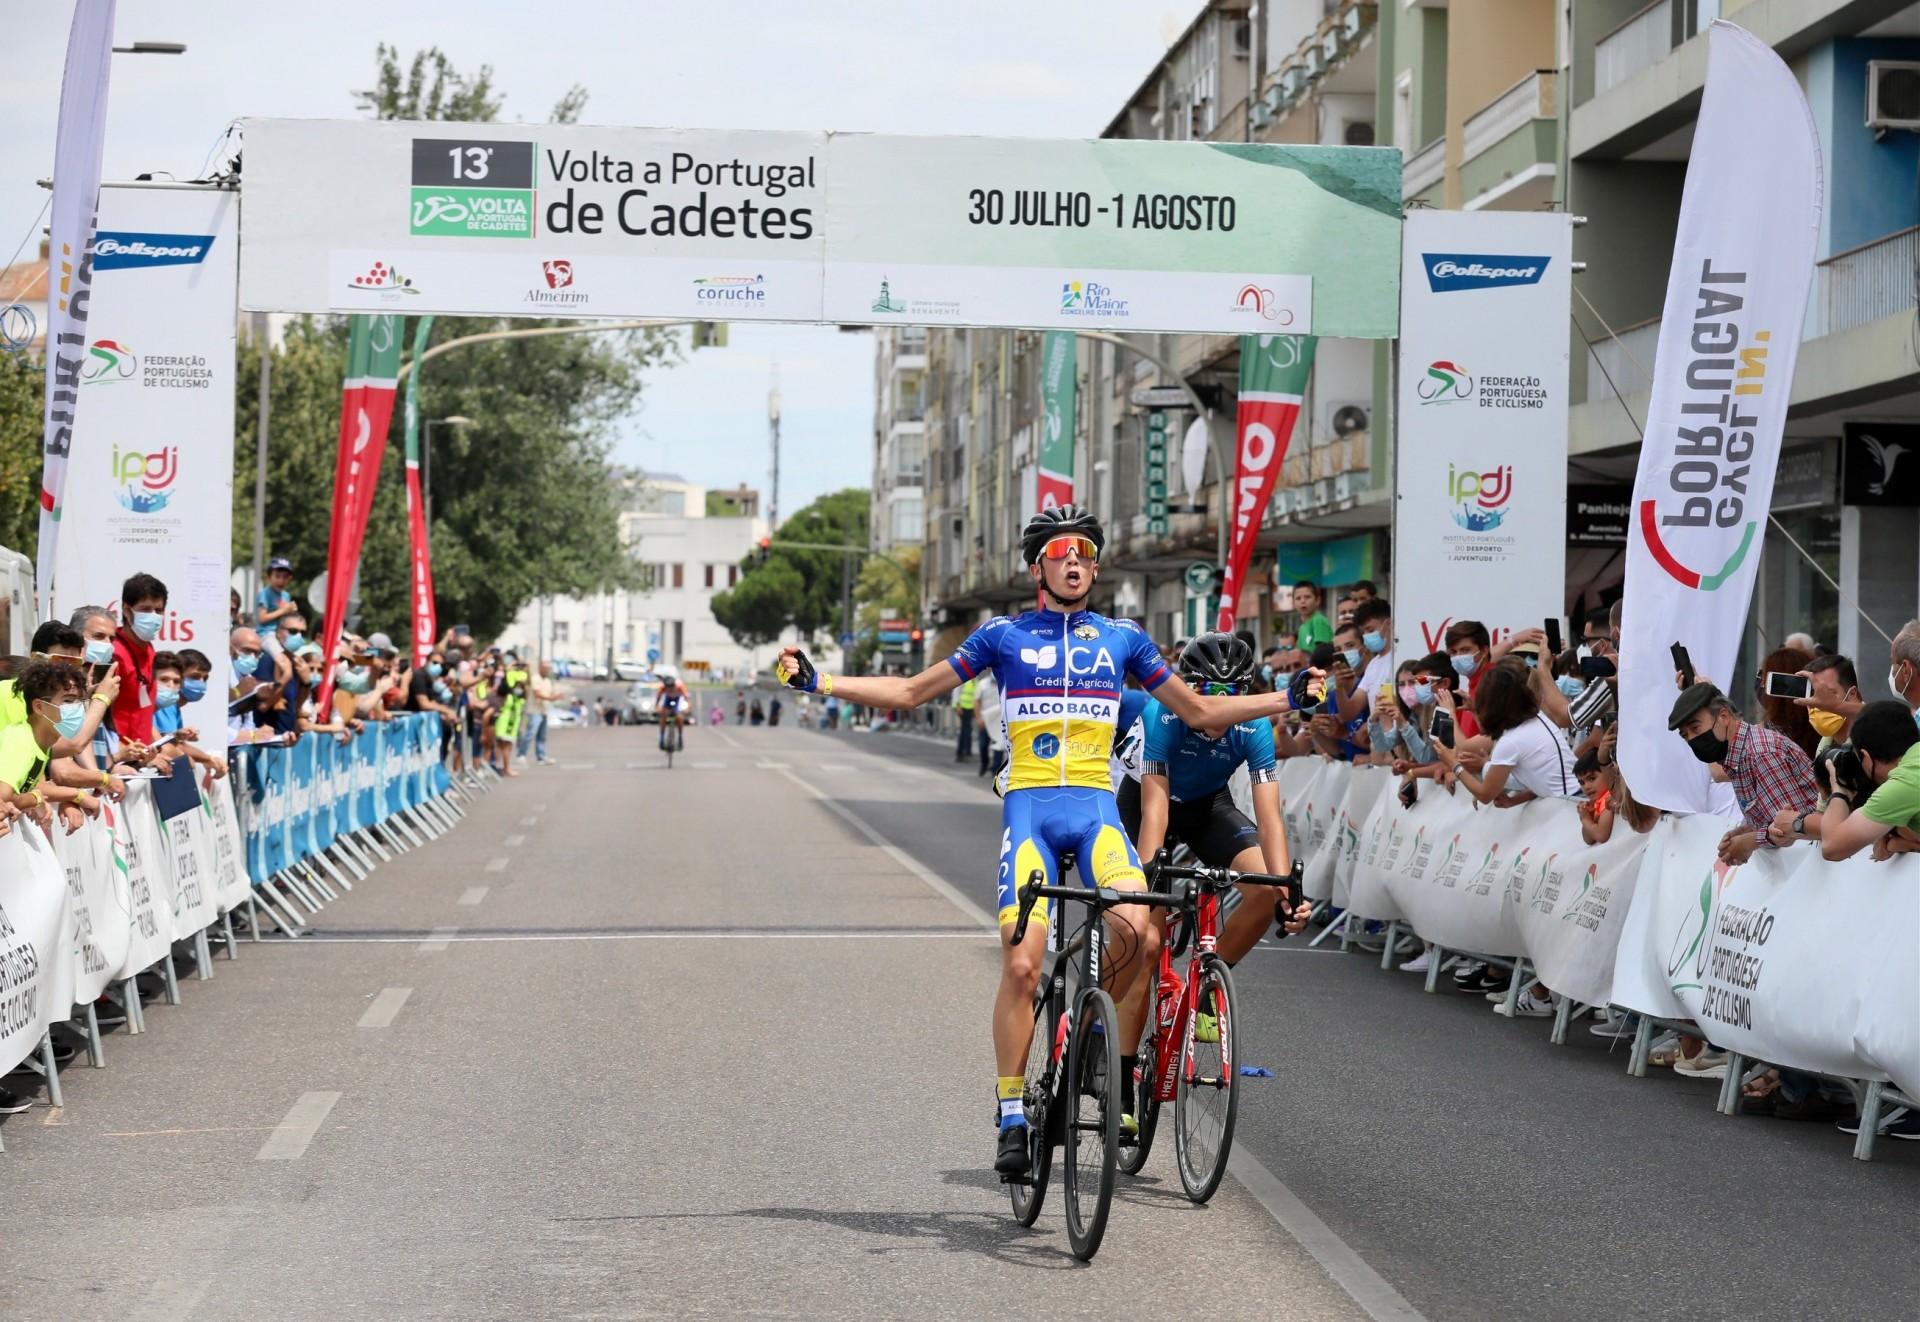 Tiago Santos conquista Volta a Portugal de Cadetes